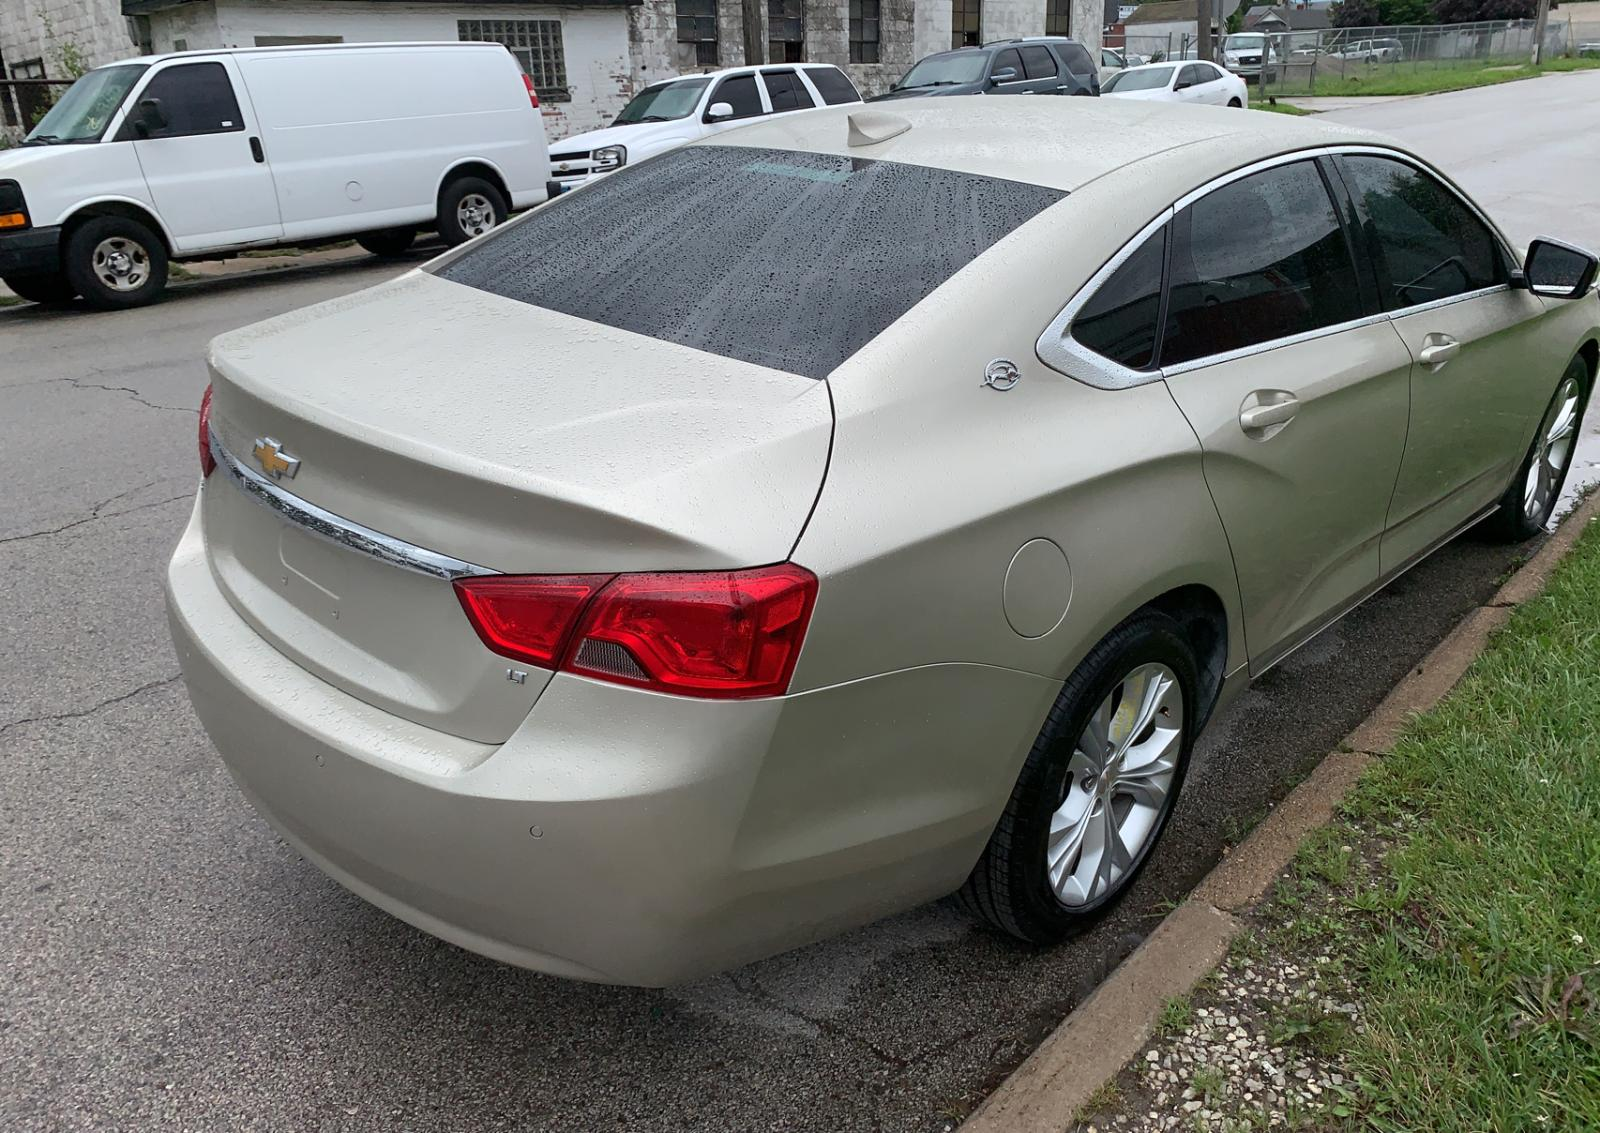 2G1125S37F9275522 - 2015 Chevrolet Impala Lt 3.6L rear view